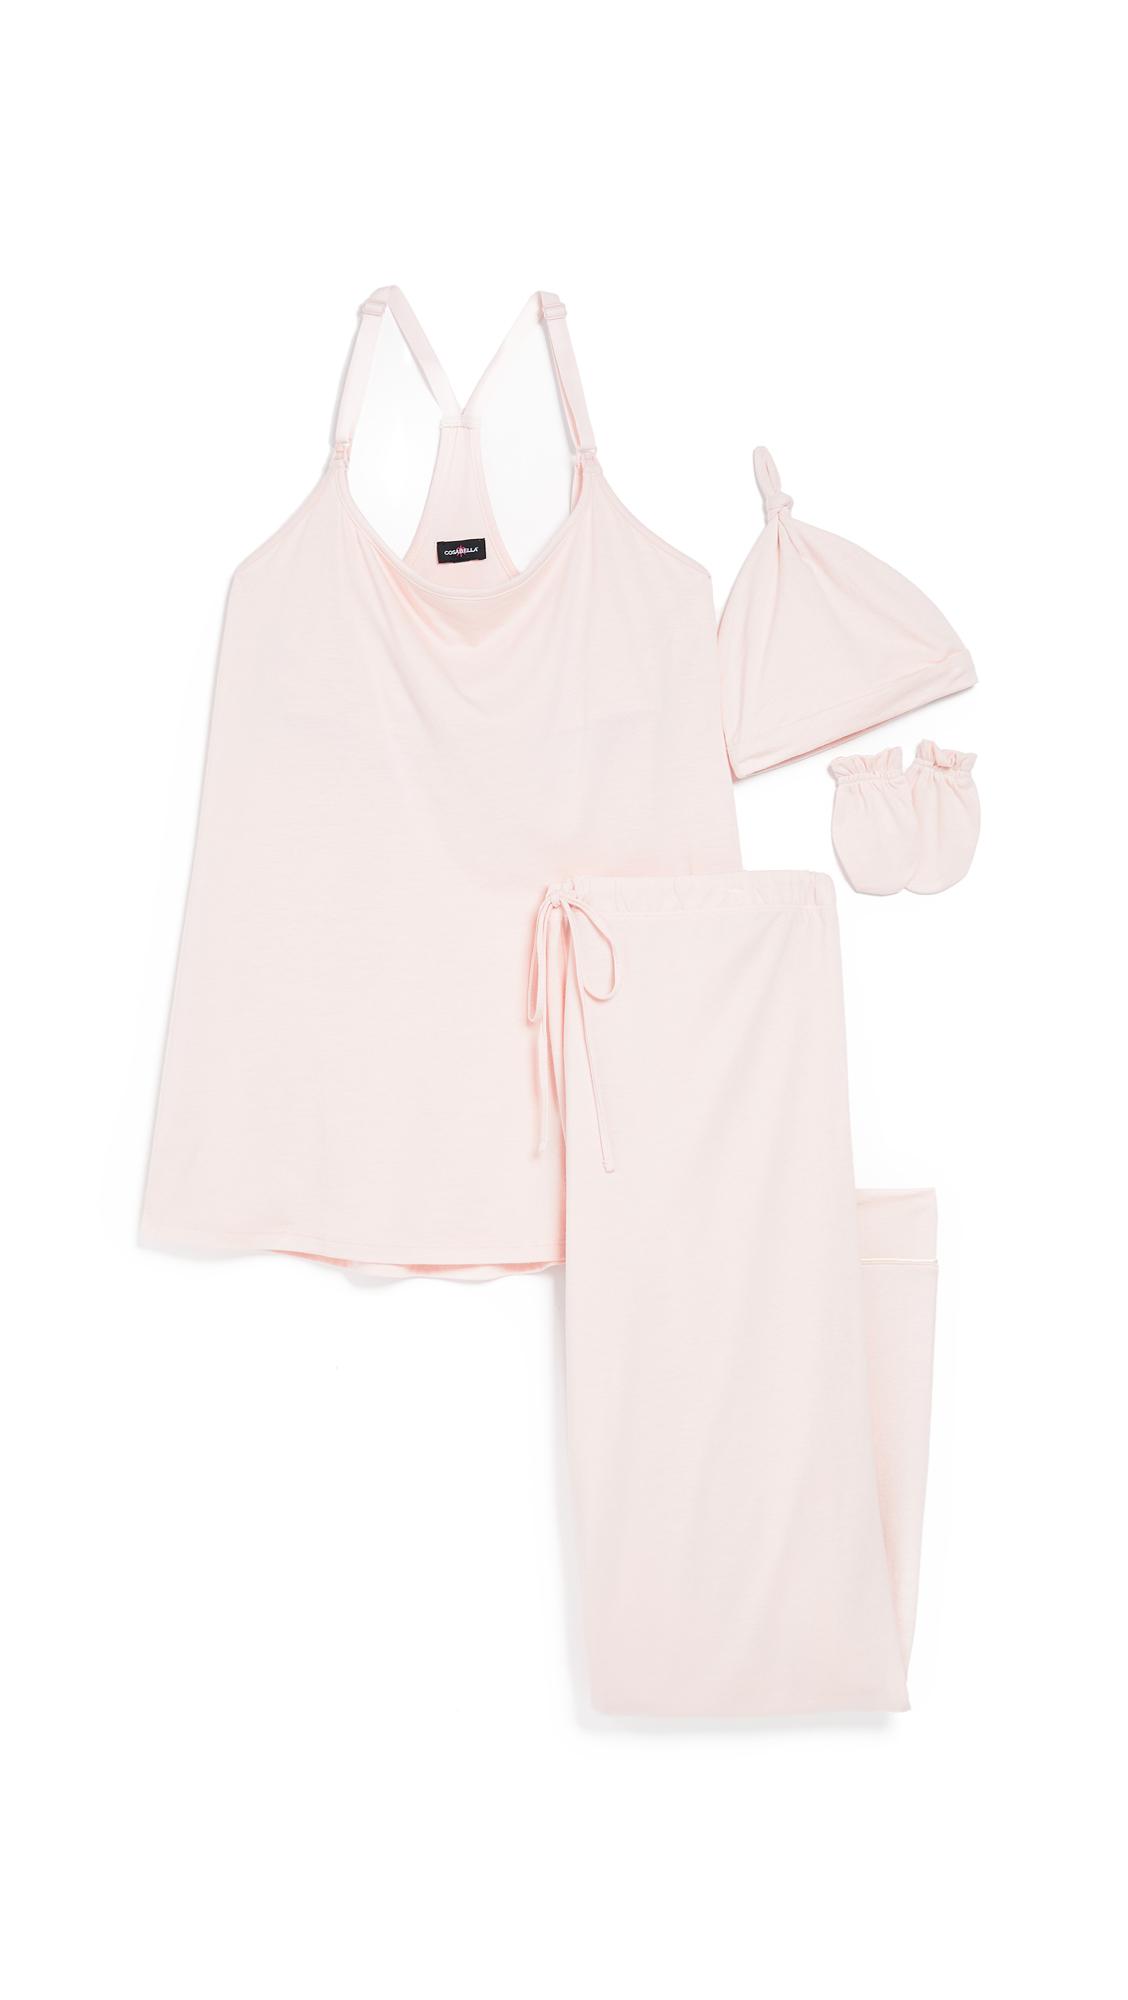 Bella Maternity Pj Set Gifting Package, Rose Dawn/Moon Ivory